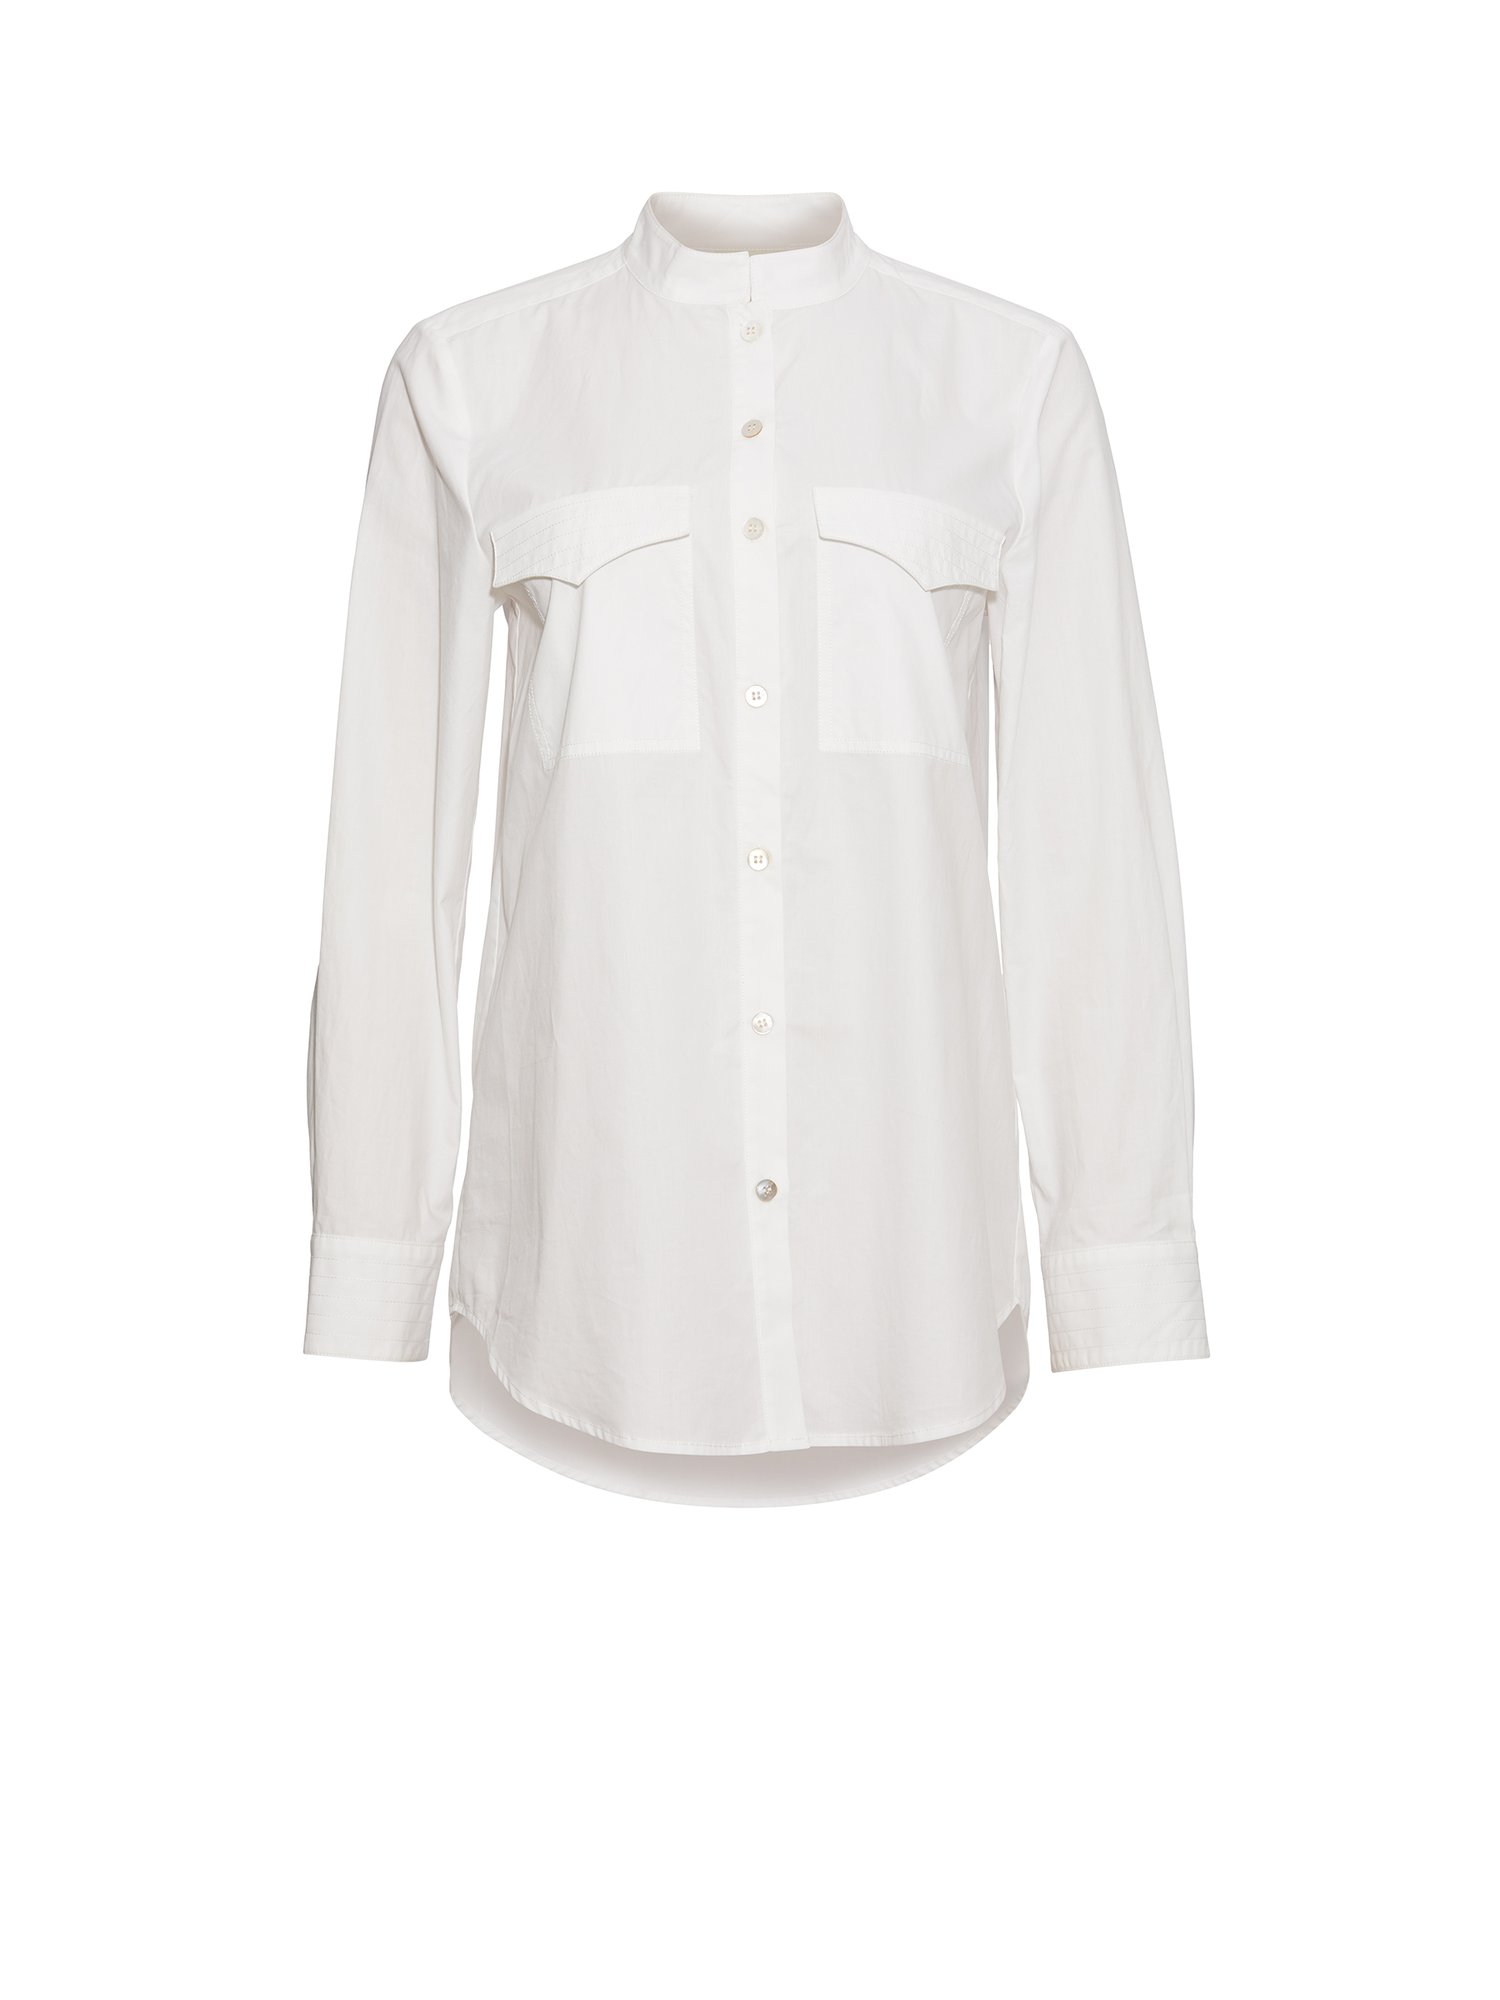 HeartmadeJulie Fagerholt Malia Shirt White